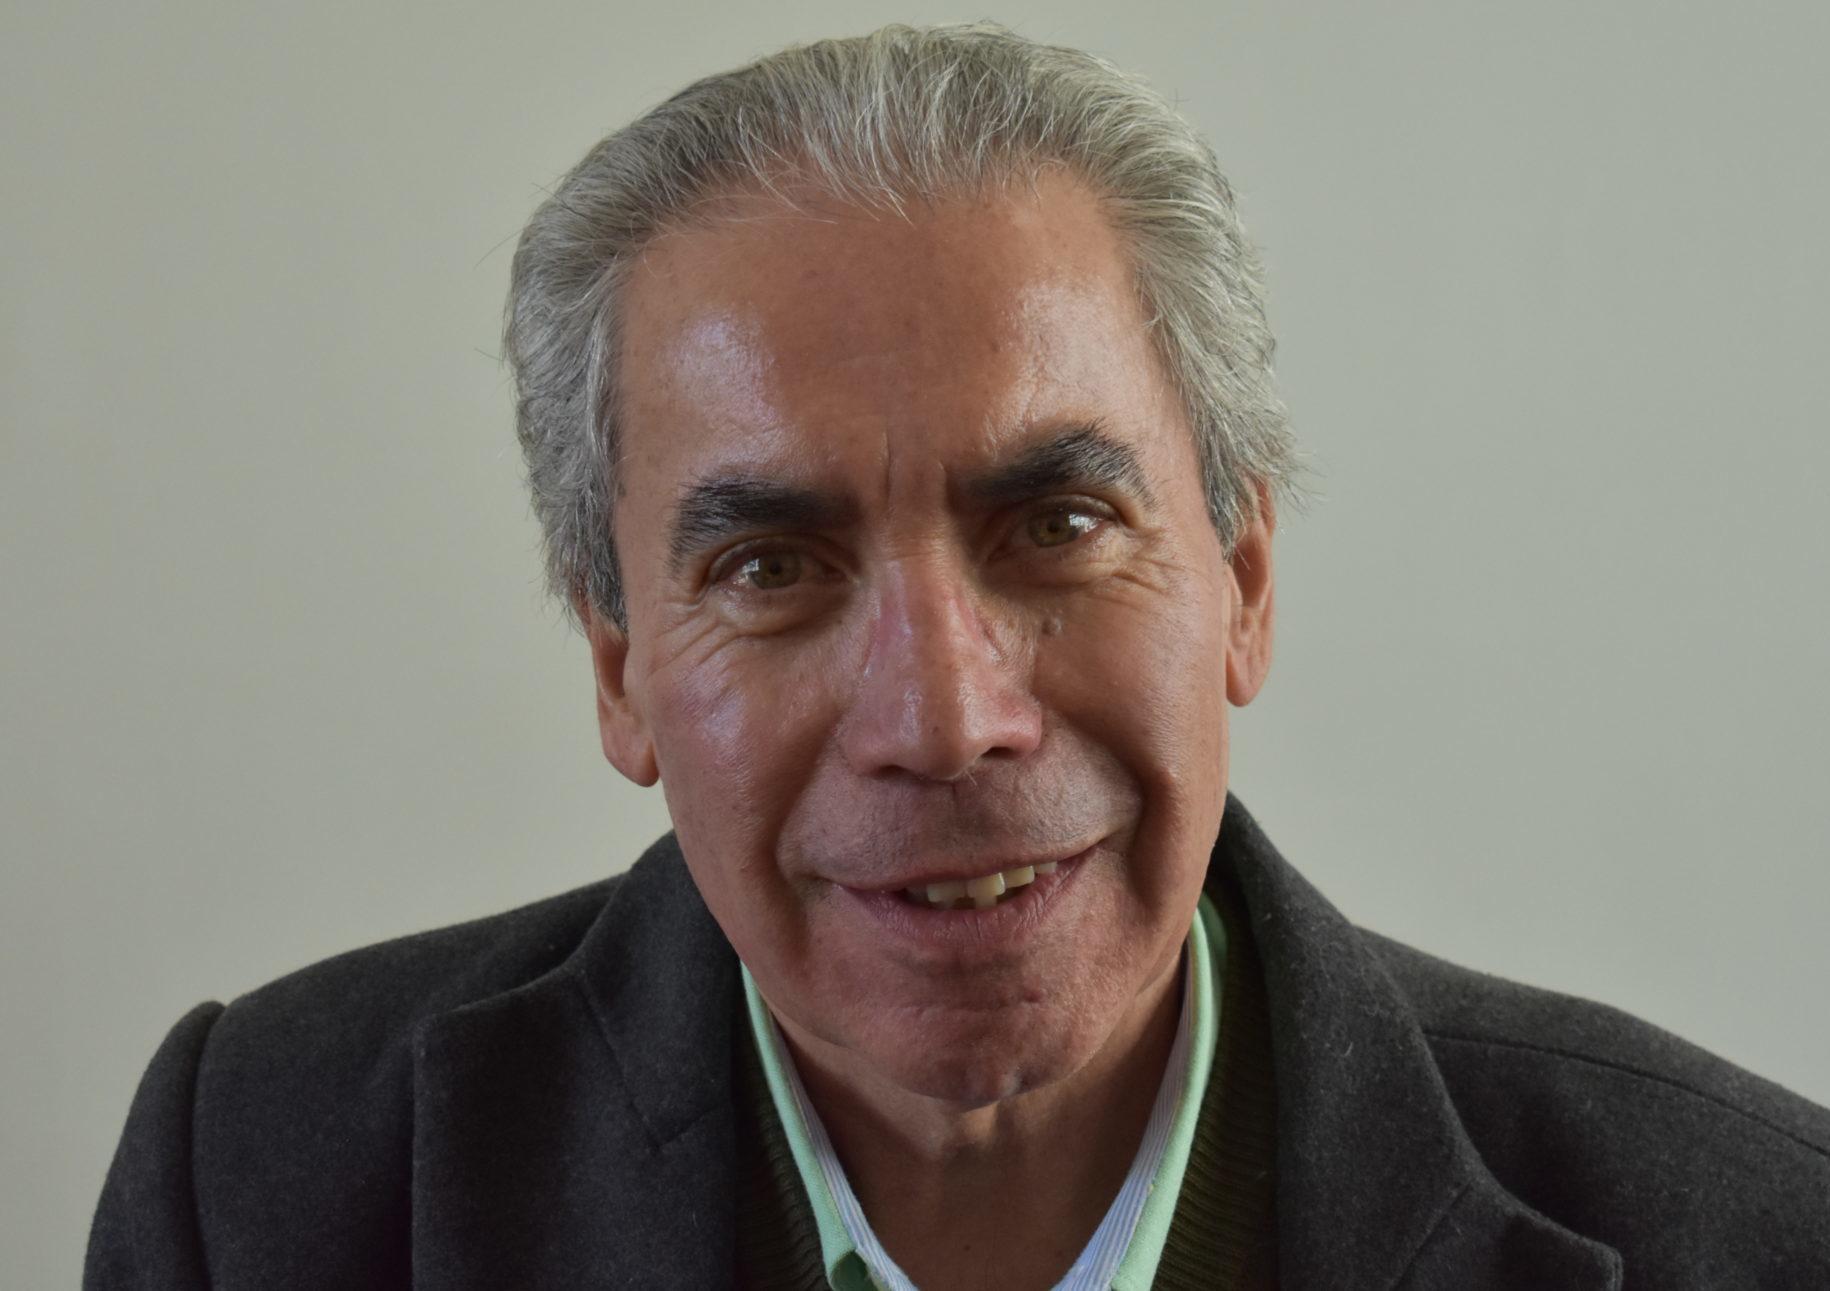 Carlos Padilla